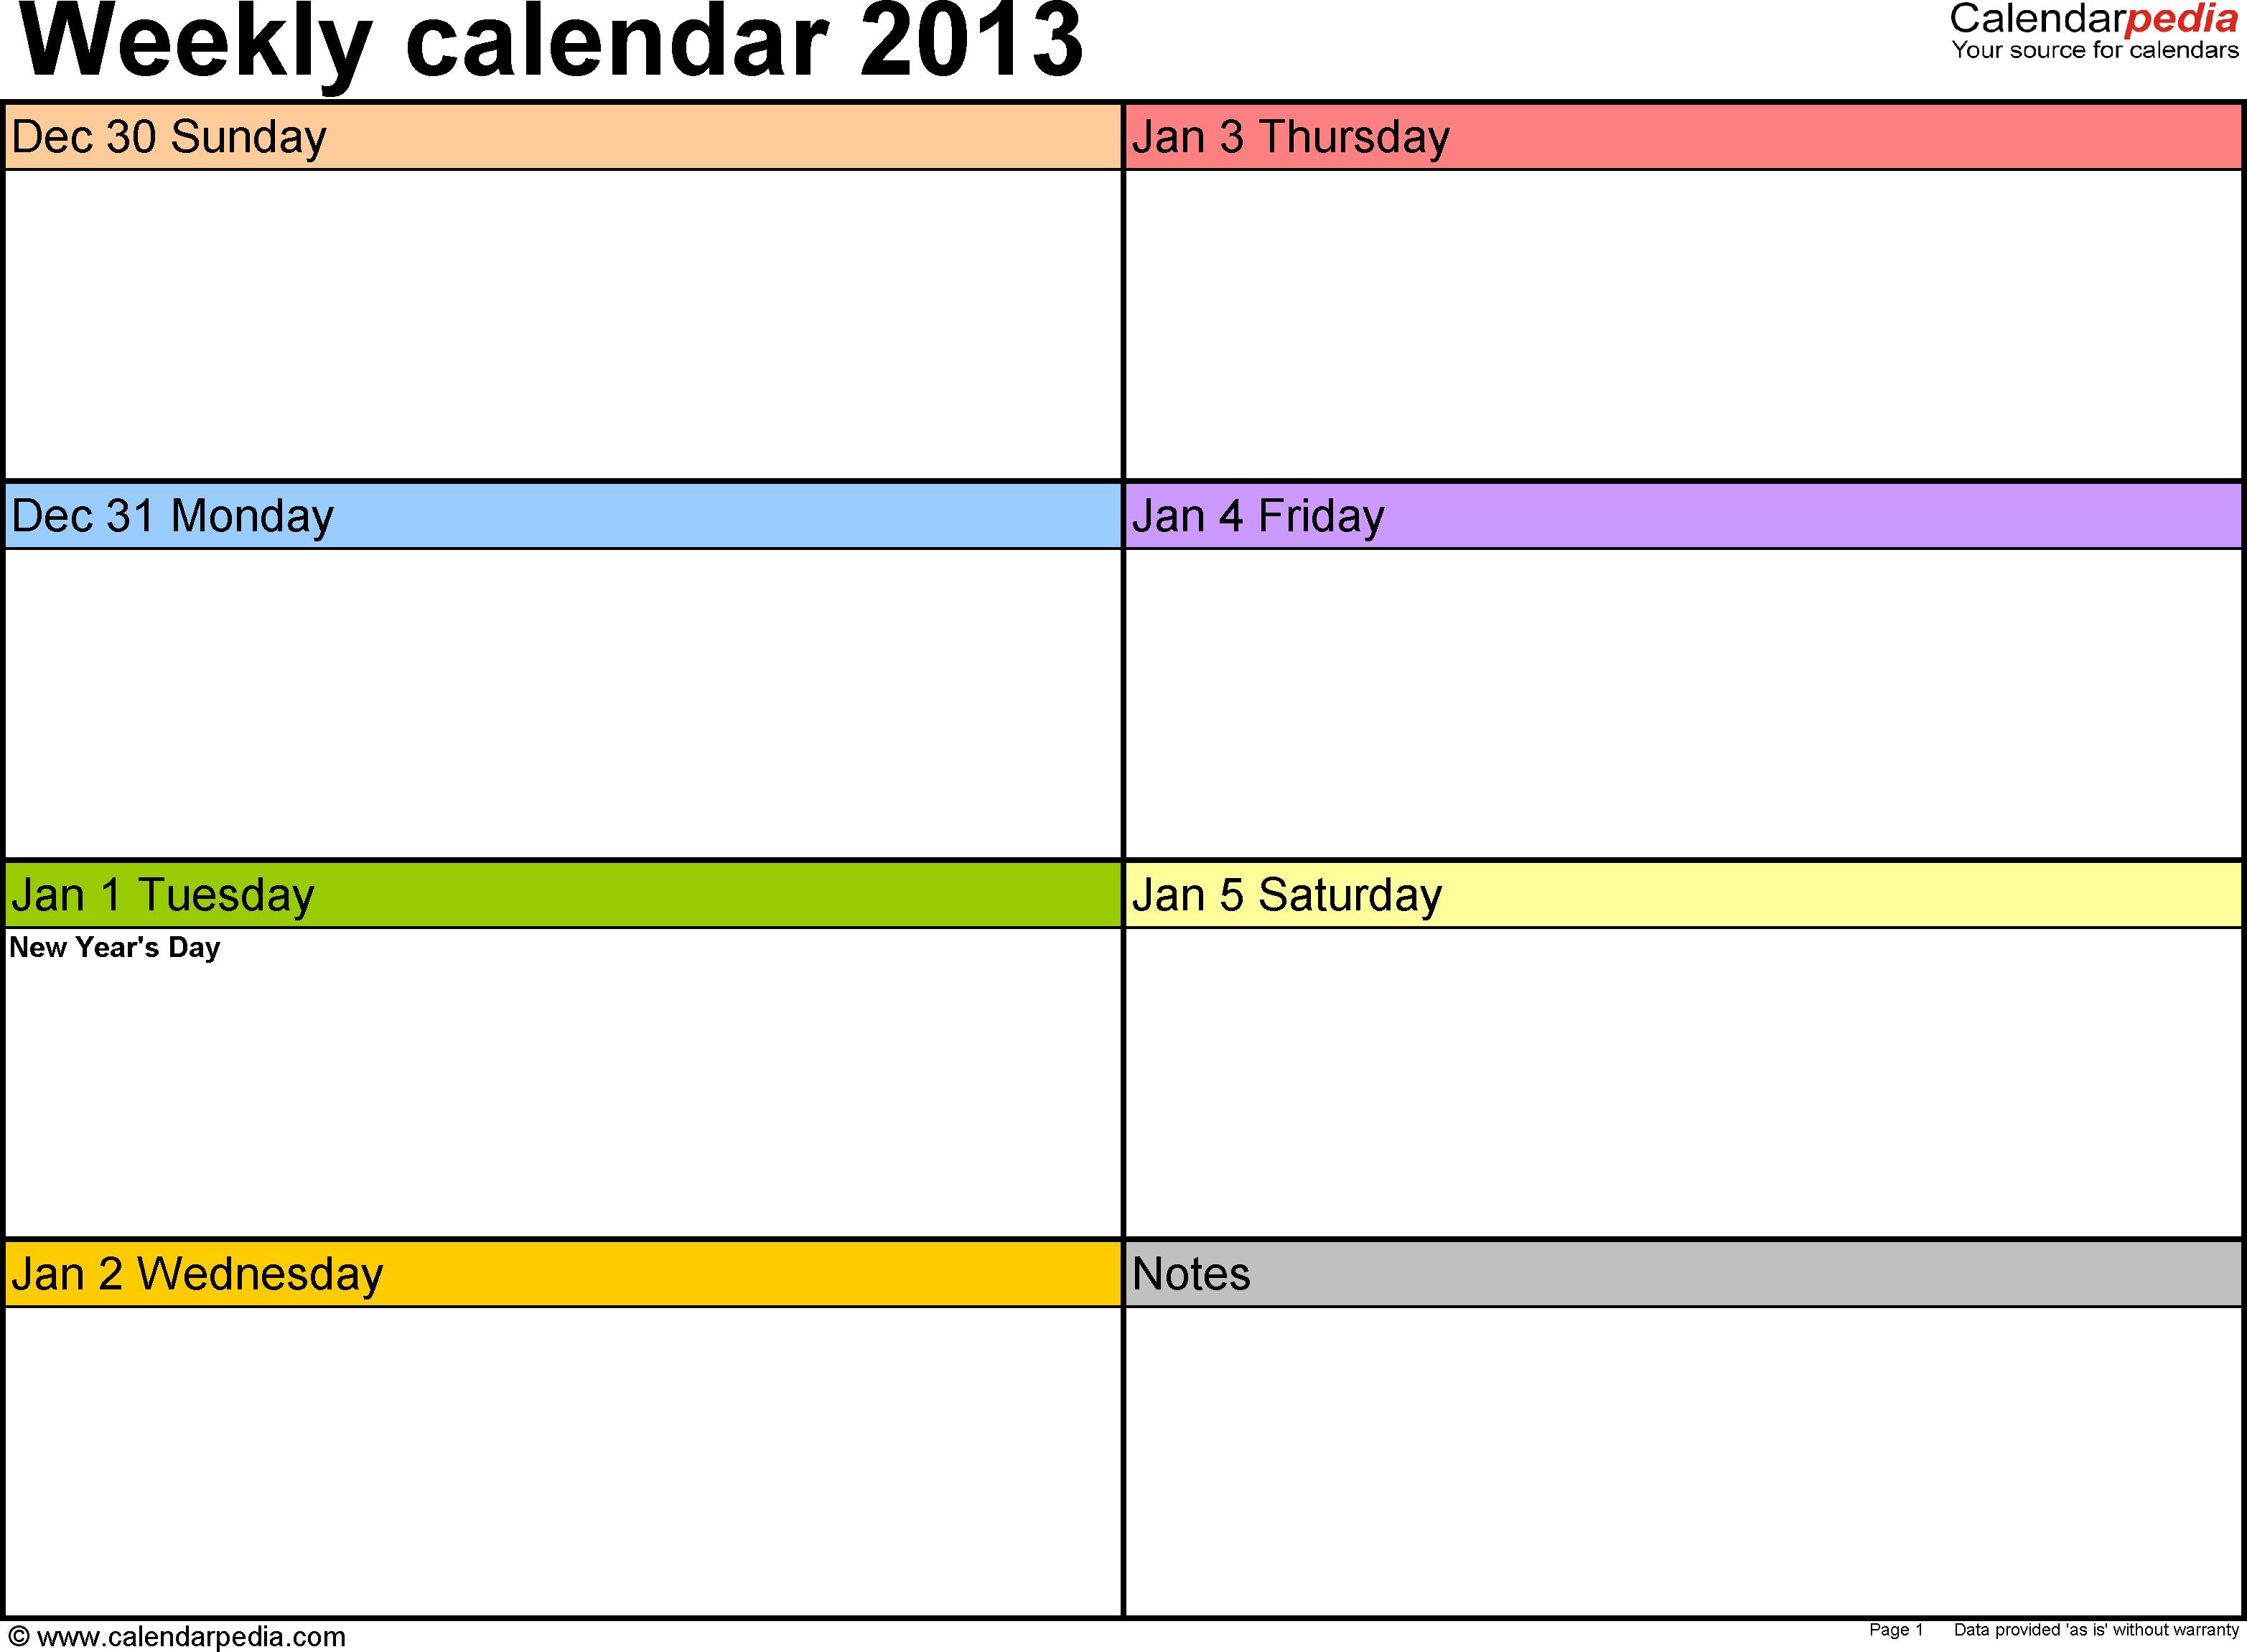 Schedule Template Two Week Calendar Word Weekly For Free Printable throughout Two Week Calendar Template Free